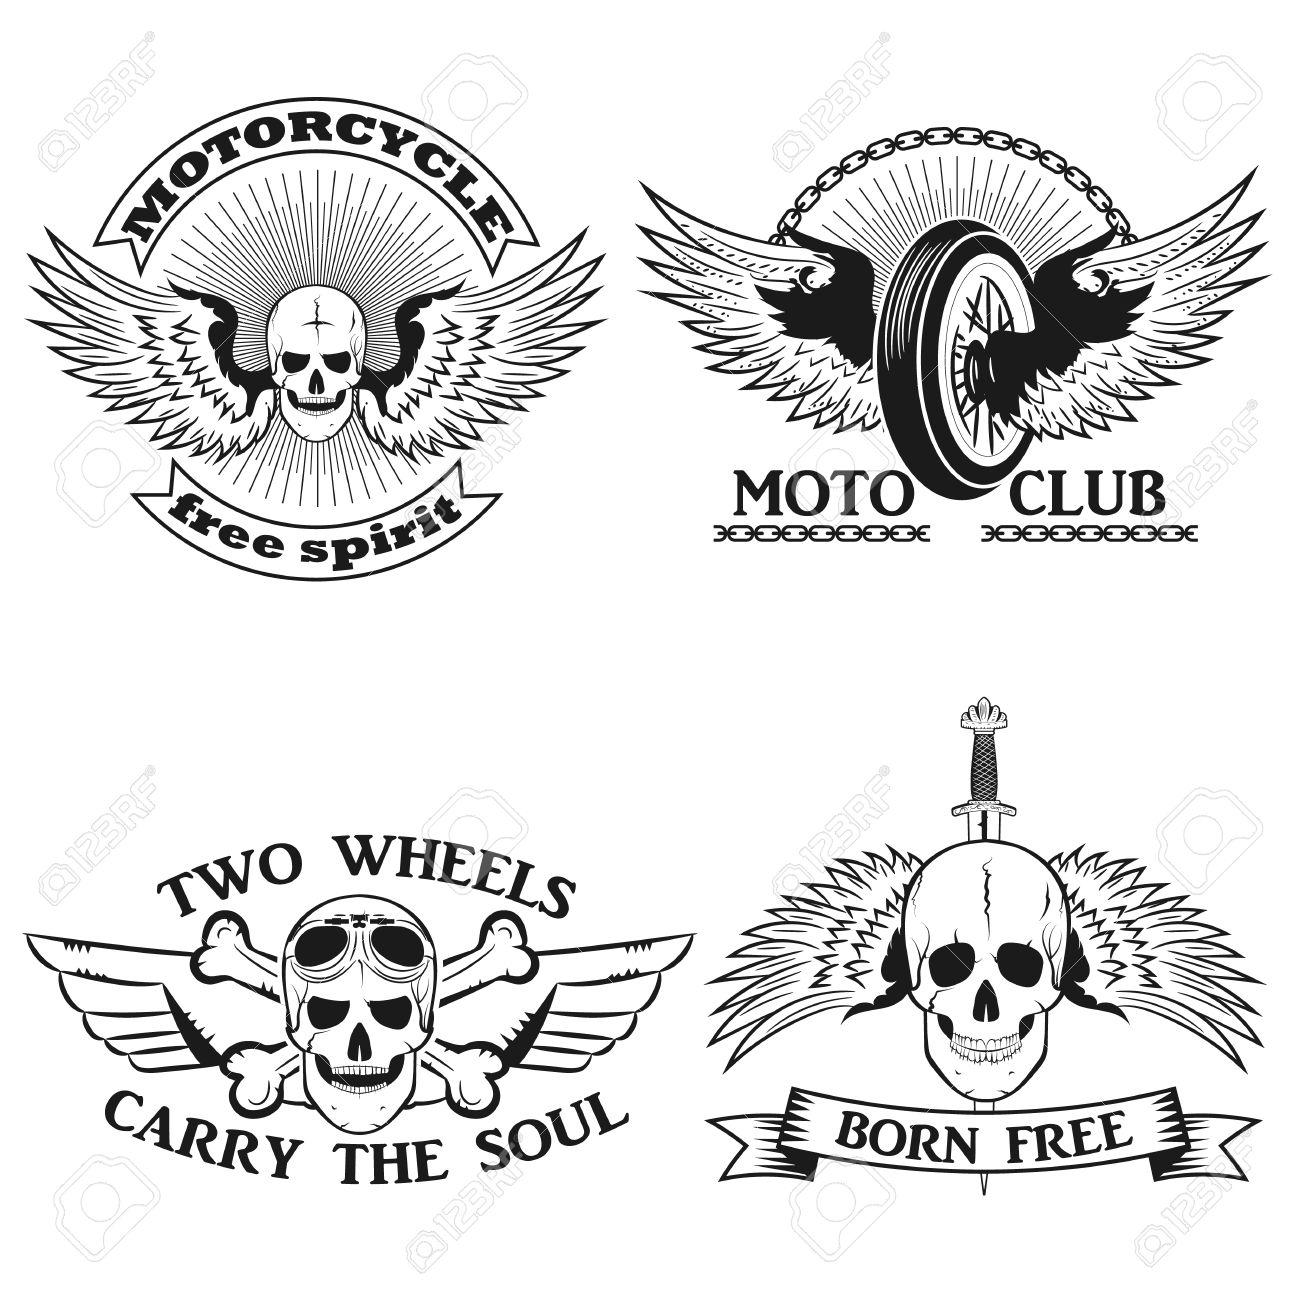 Motorcycle with biker tattoo - Moto Logo Biker Stripe Skull With Wings Motorcycle Wheel Skull And Bones Biker